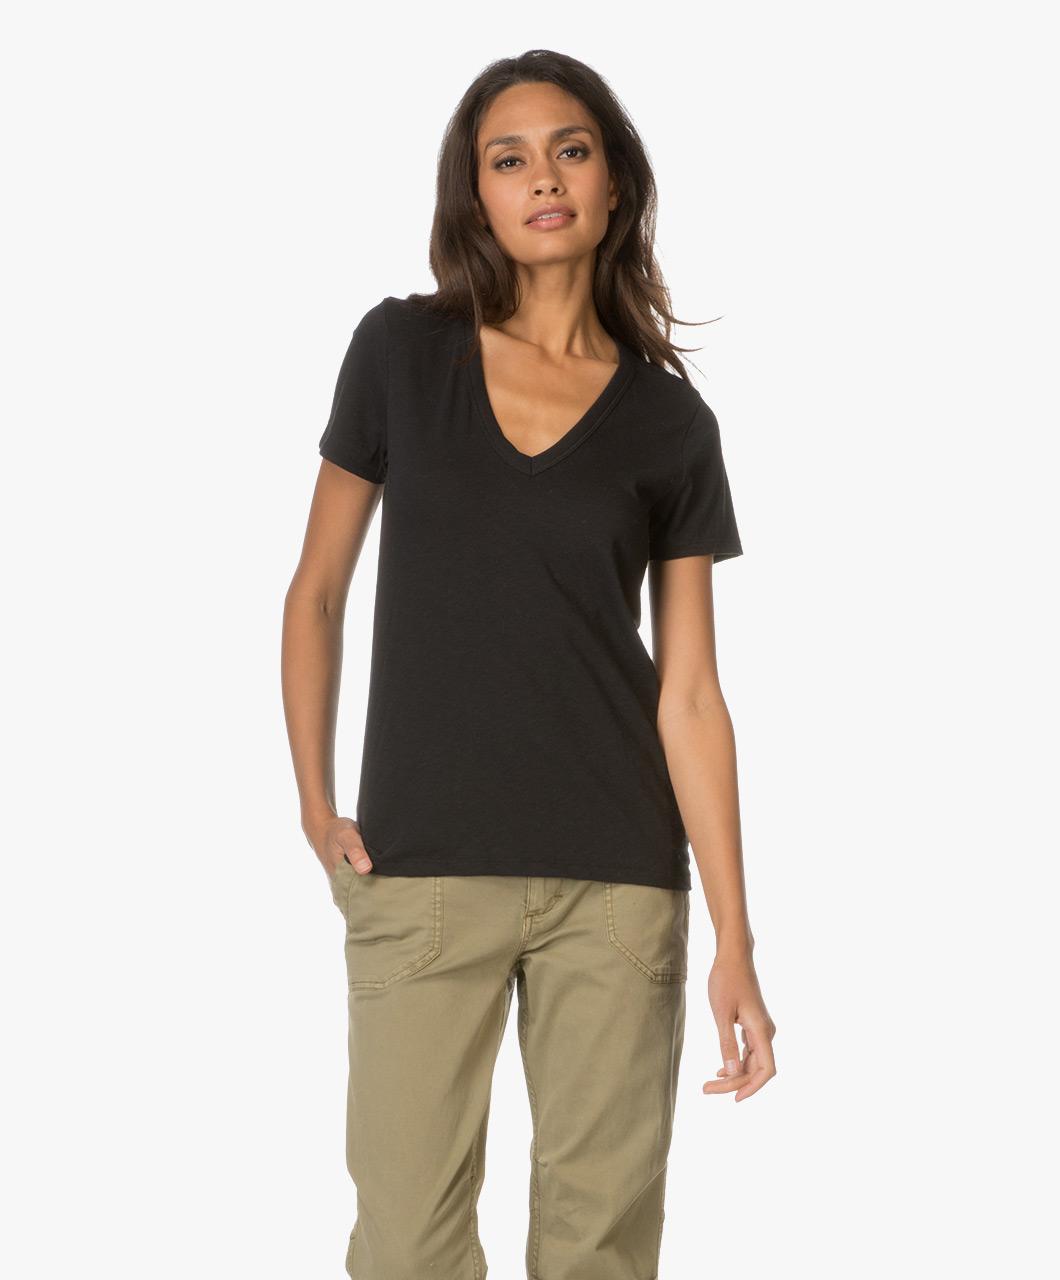 0a364b6a468f Rag & Bone / Jean The Vee T-shirt - Black - the vee | w272c34ch